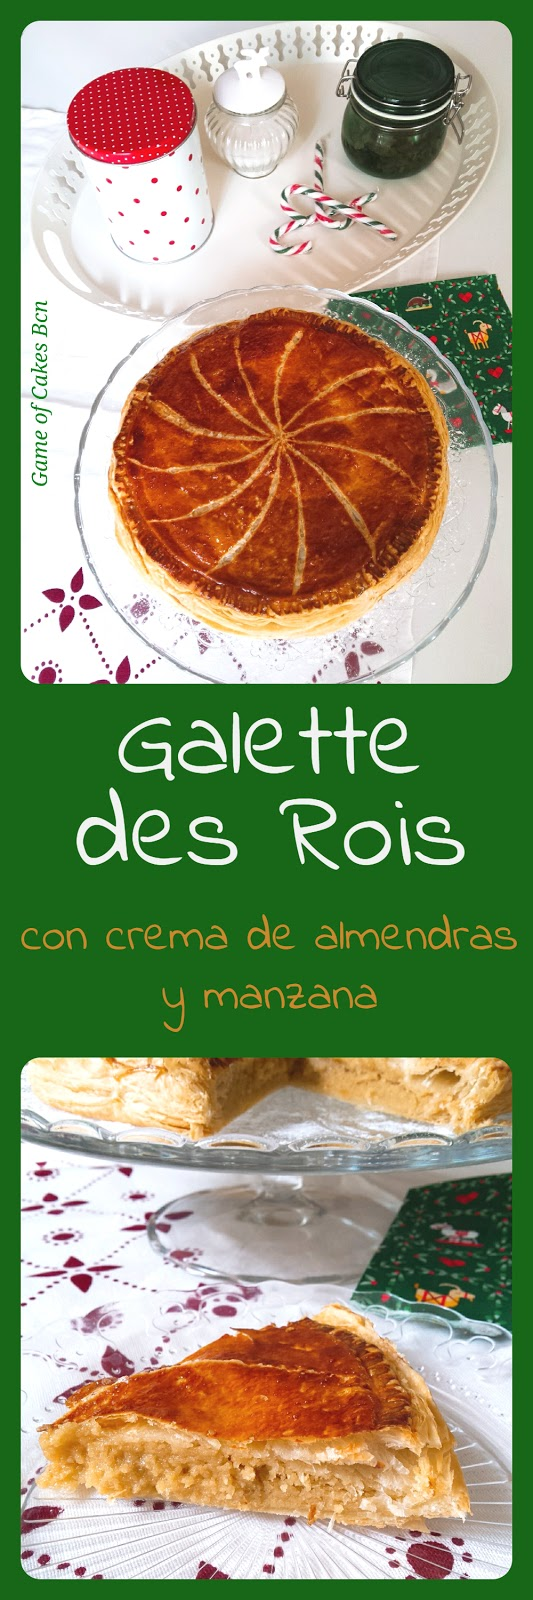 galette des rois ligera con crema de almendras y manzana game of cakes bcn